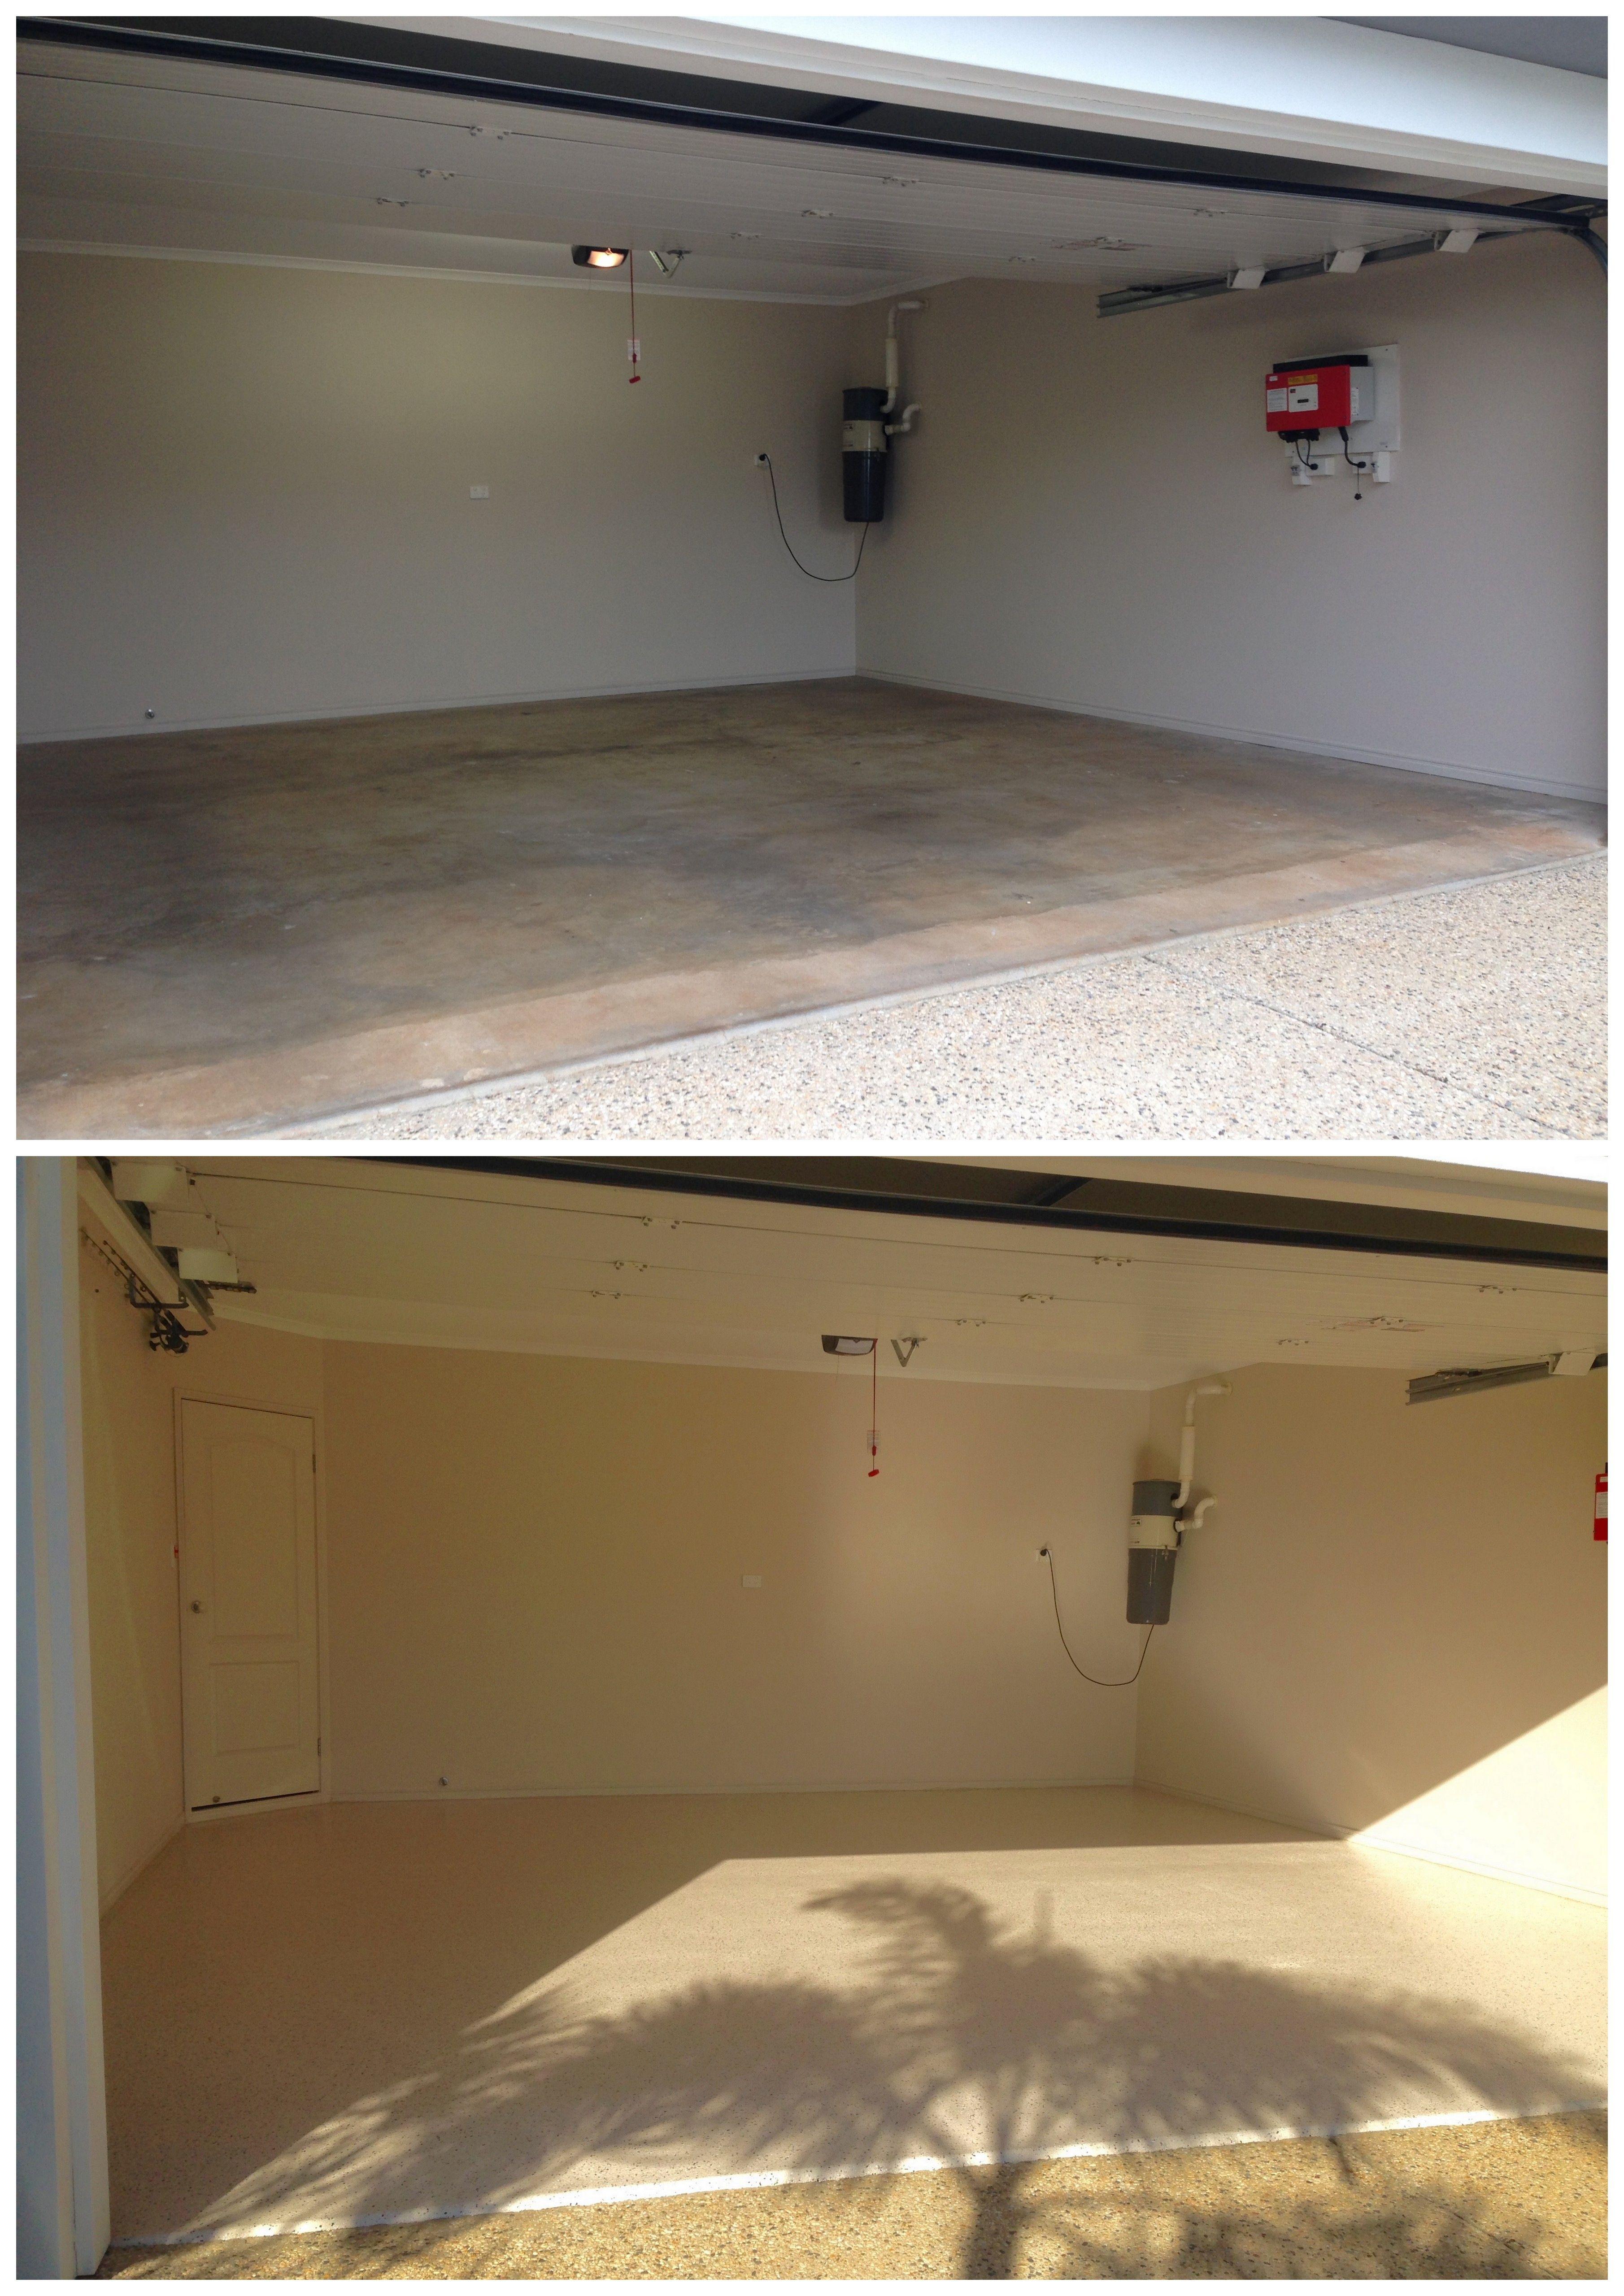 Buderim Epoxy Flooring by The Garage Floor Co. Transform